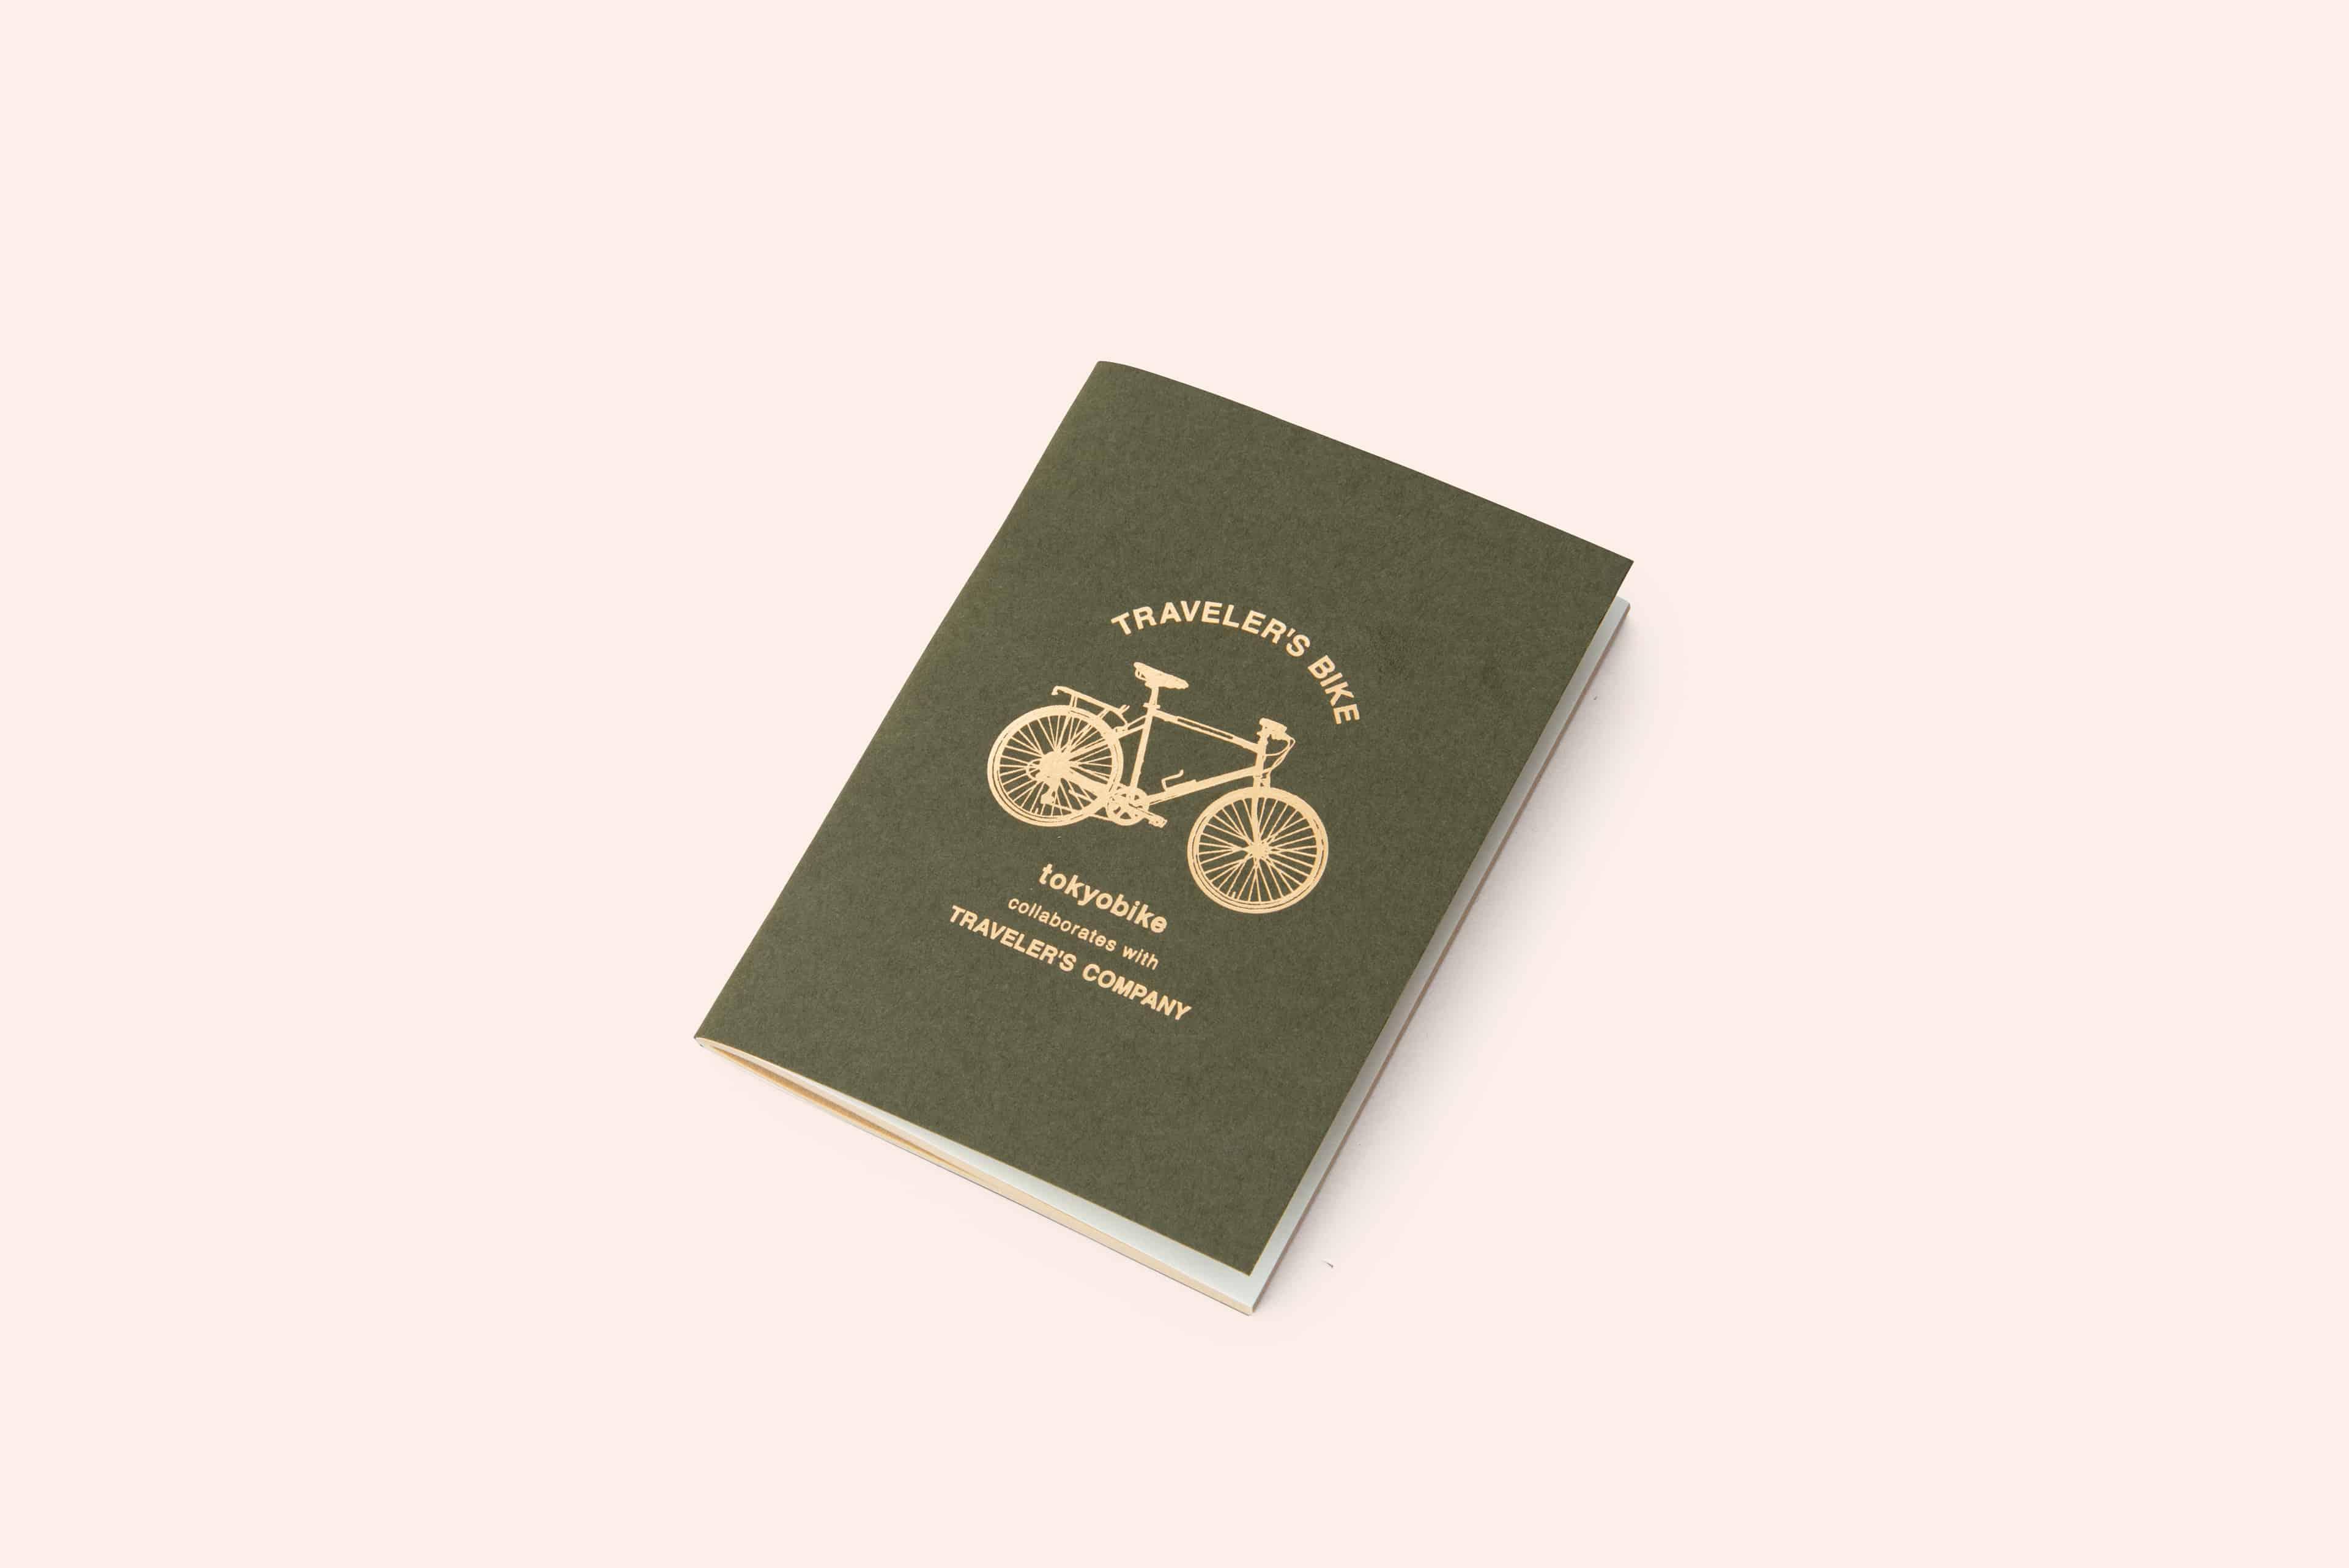 tokyobike TOKYOBIKE TRAVELER'S FACTORY トラベラーズファクトリー TRAVELER'S COMPANY トラベラーズカンパニー